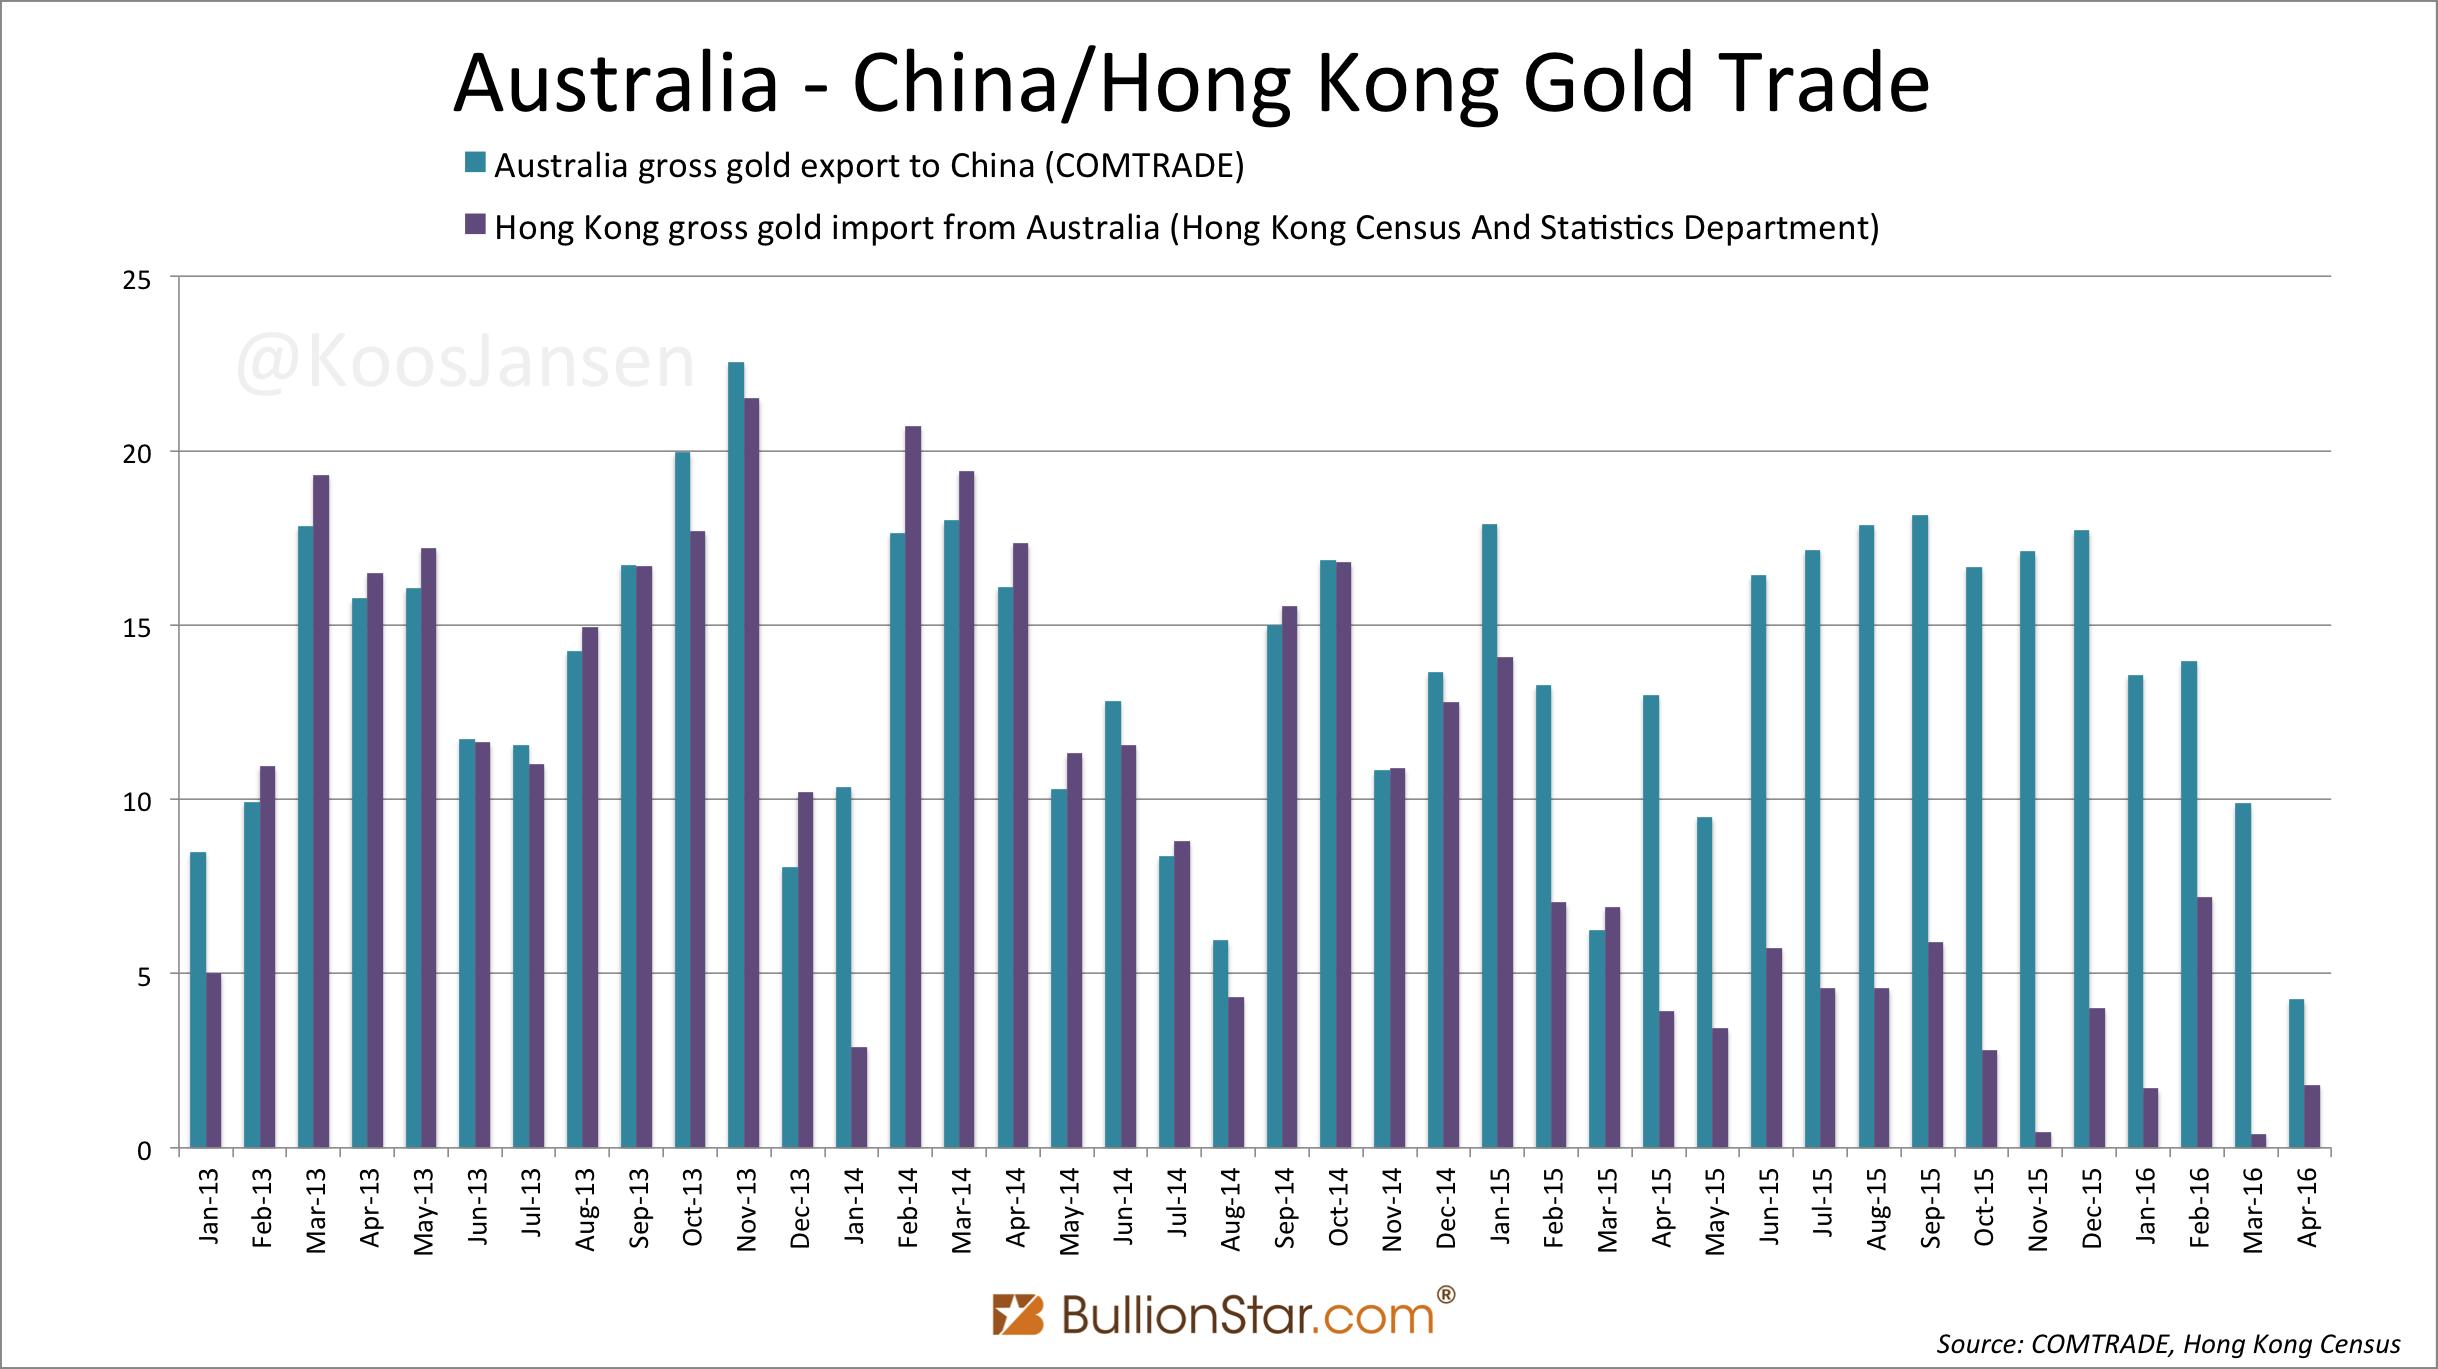 Australia Customs Department Confirms BullionStar's Analysis